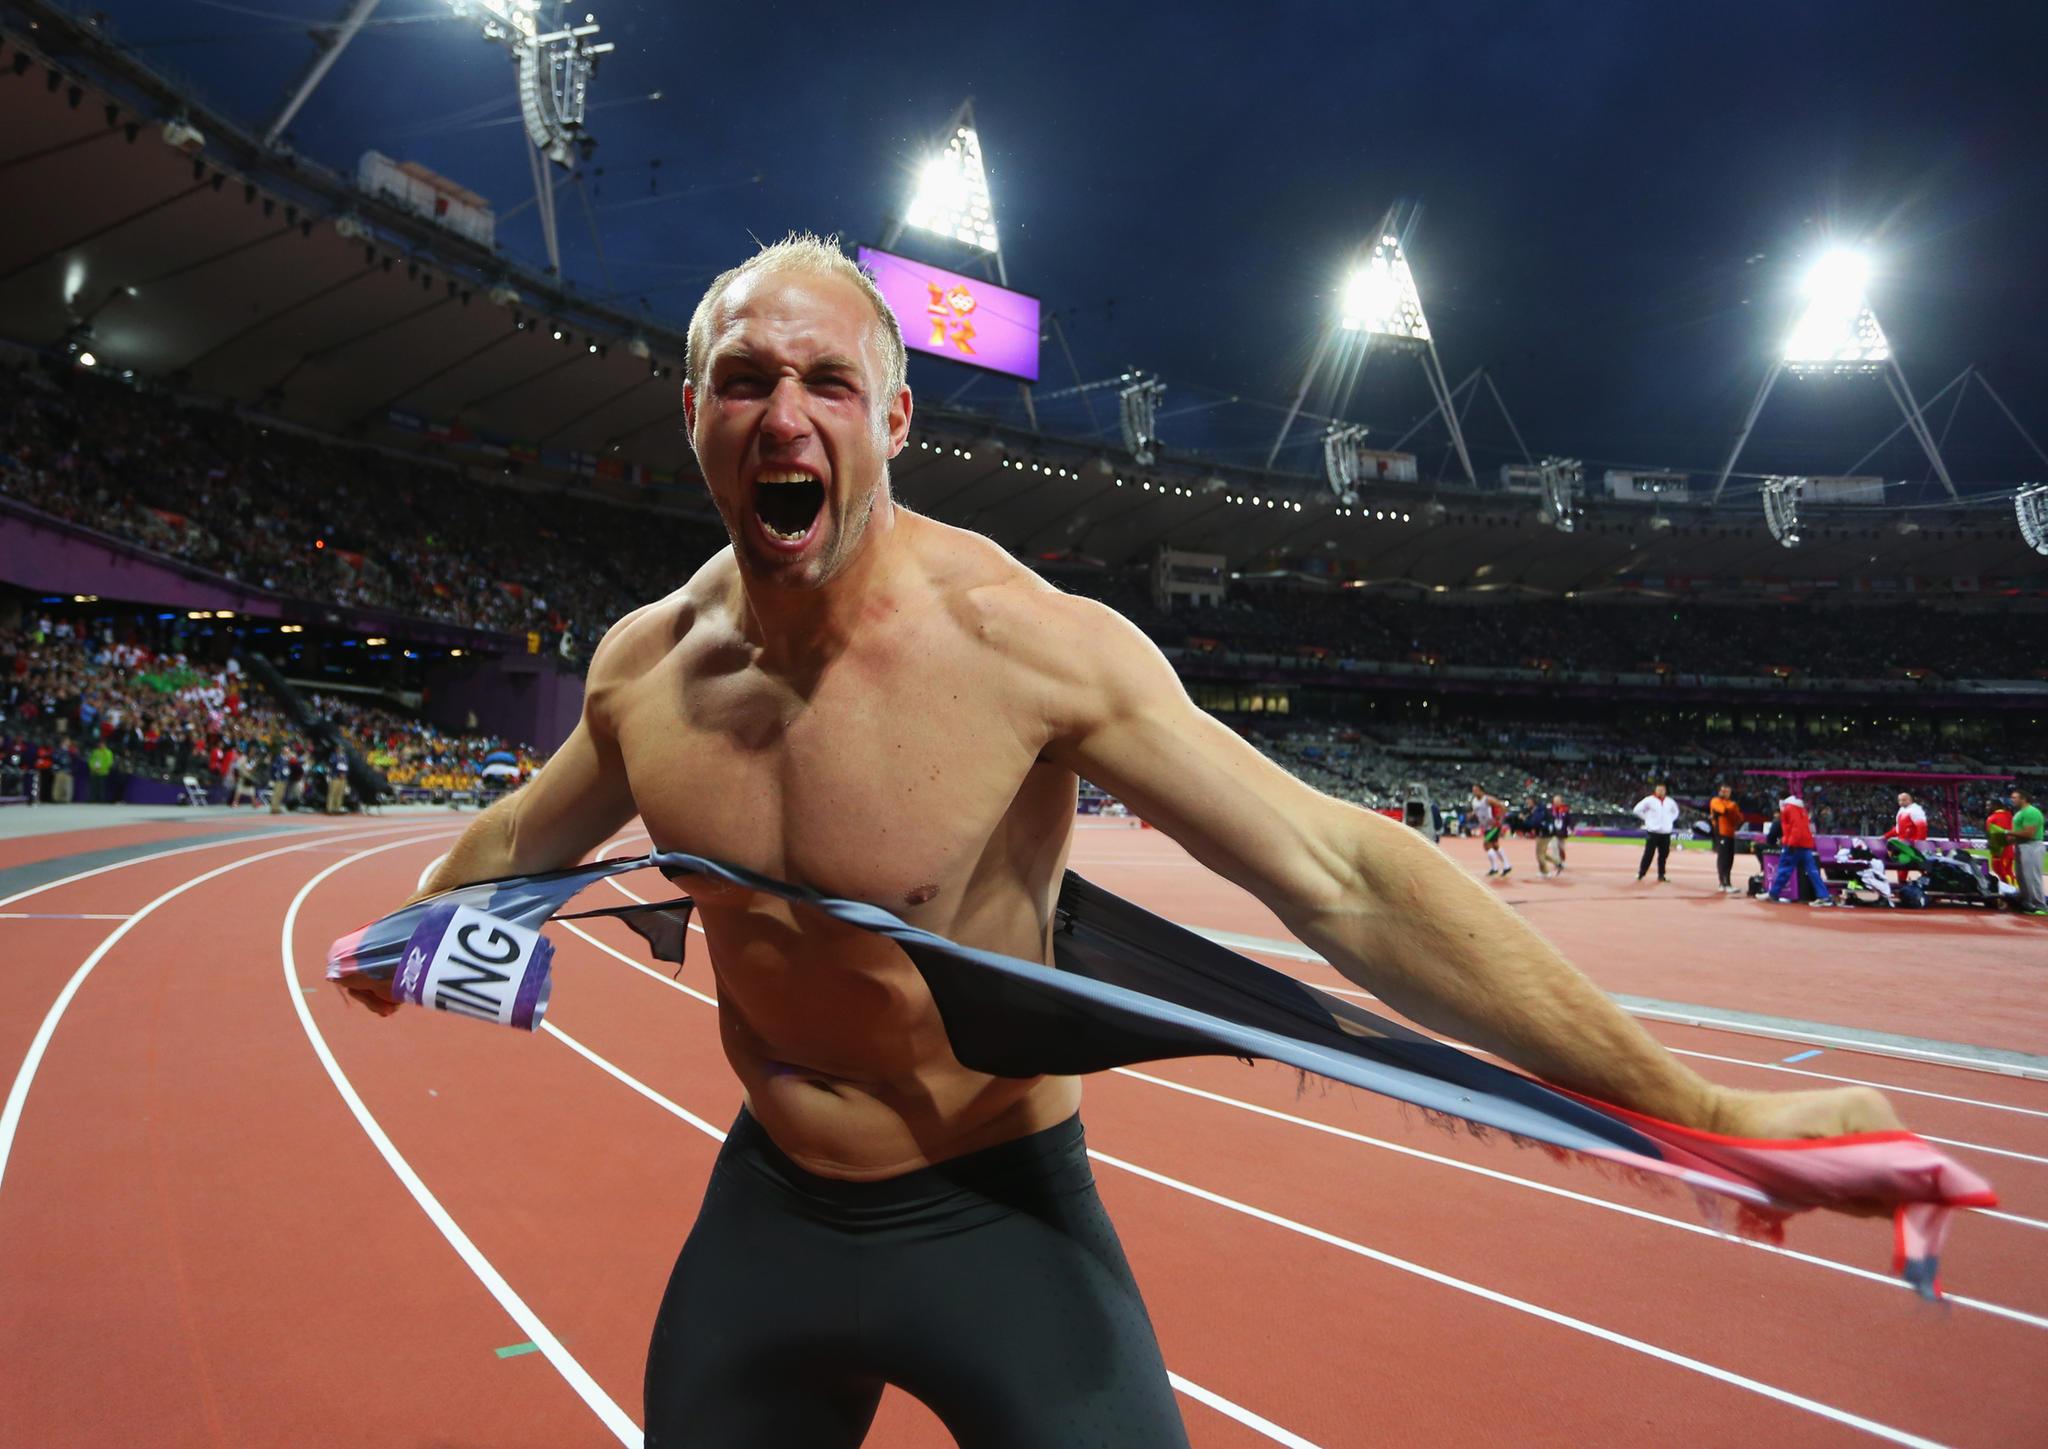 Robert Harting bei seinem Olympiasieg 2012 in London